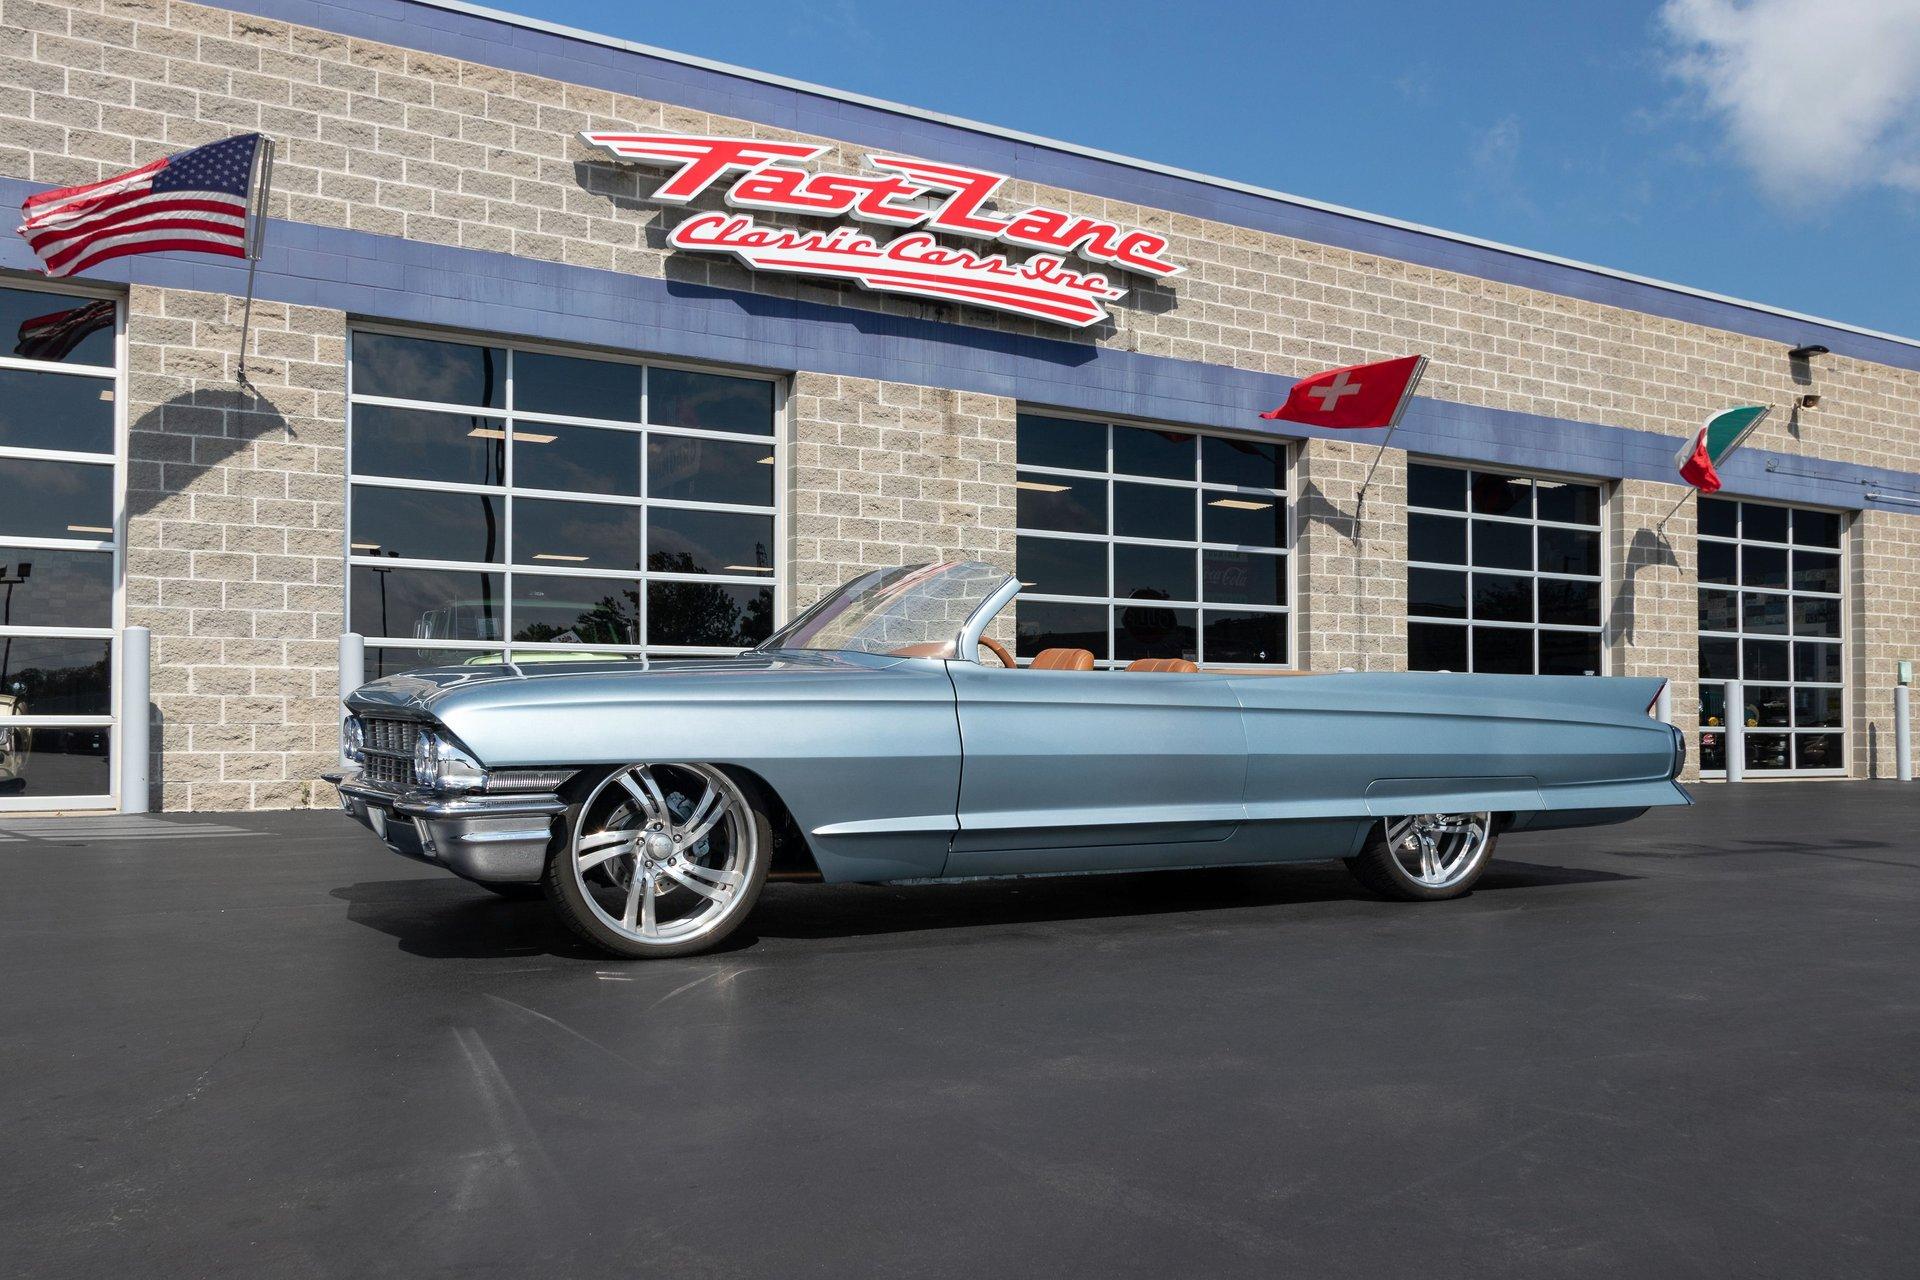 1962 cadillac series 62 custom roadster